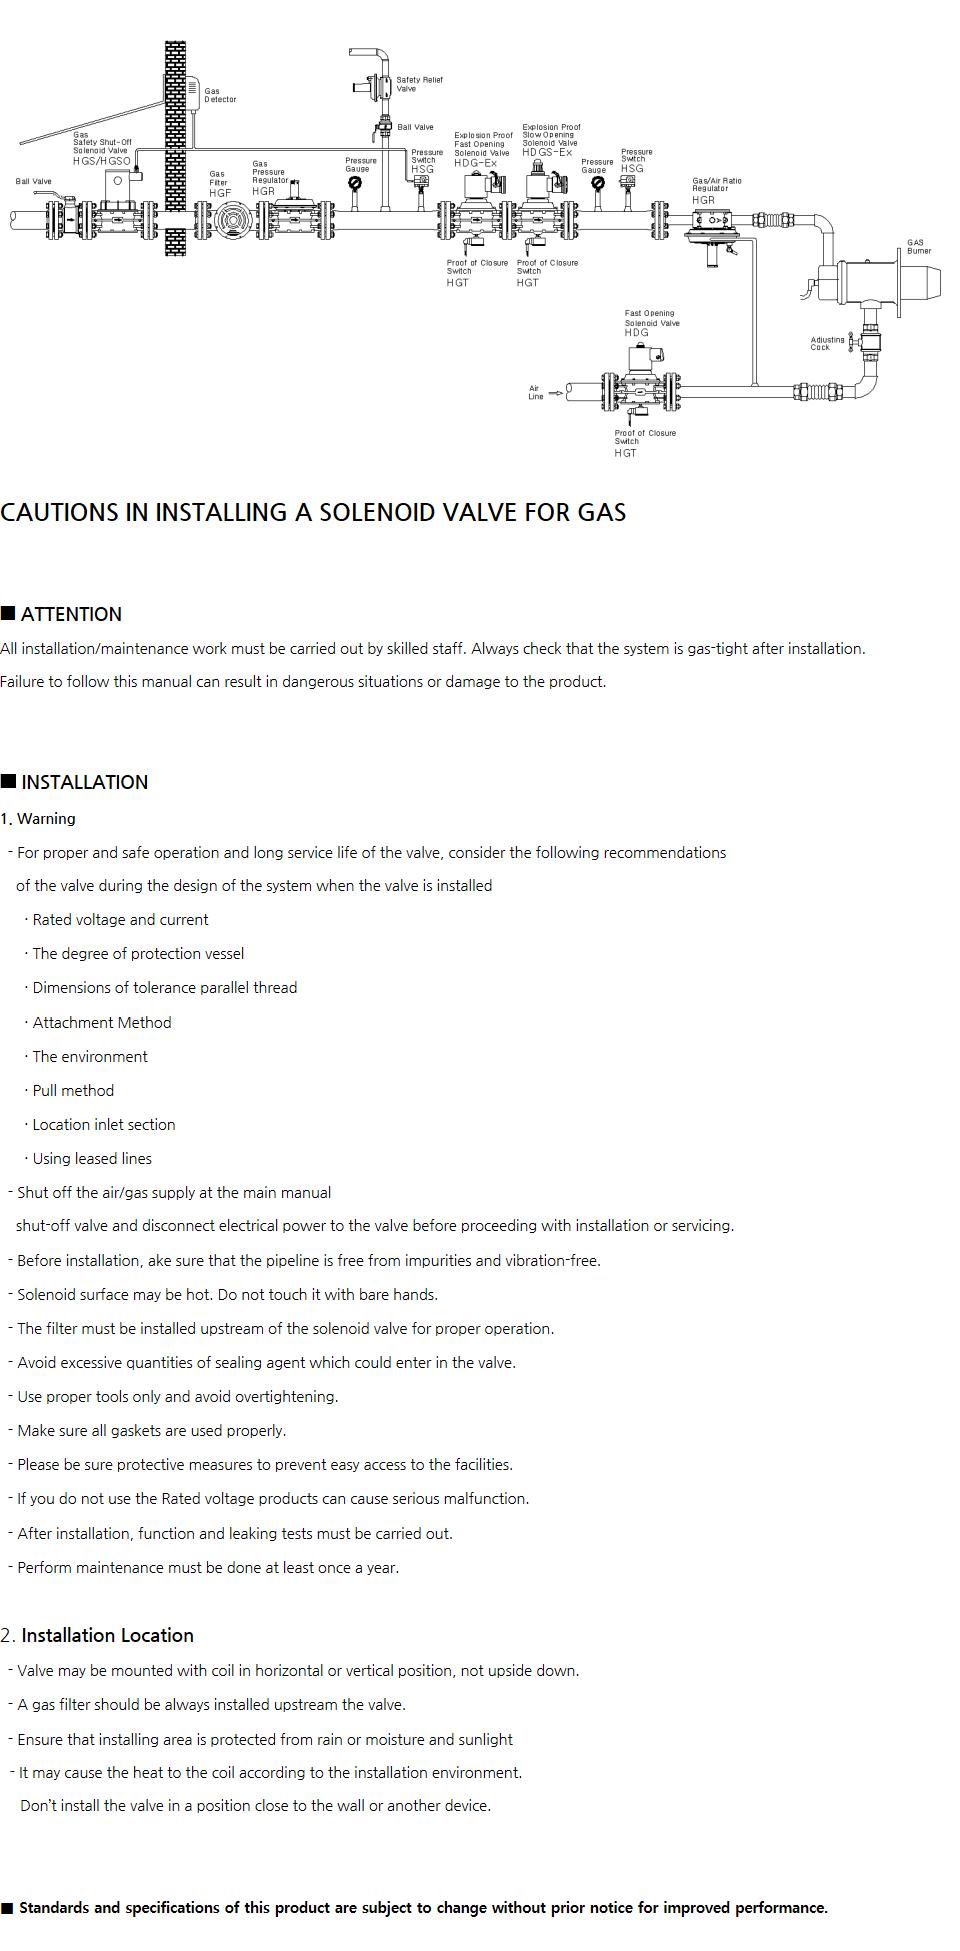 HYOSHIN MECHATRONICS Gas Equipment Arrangement  1